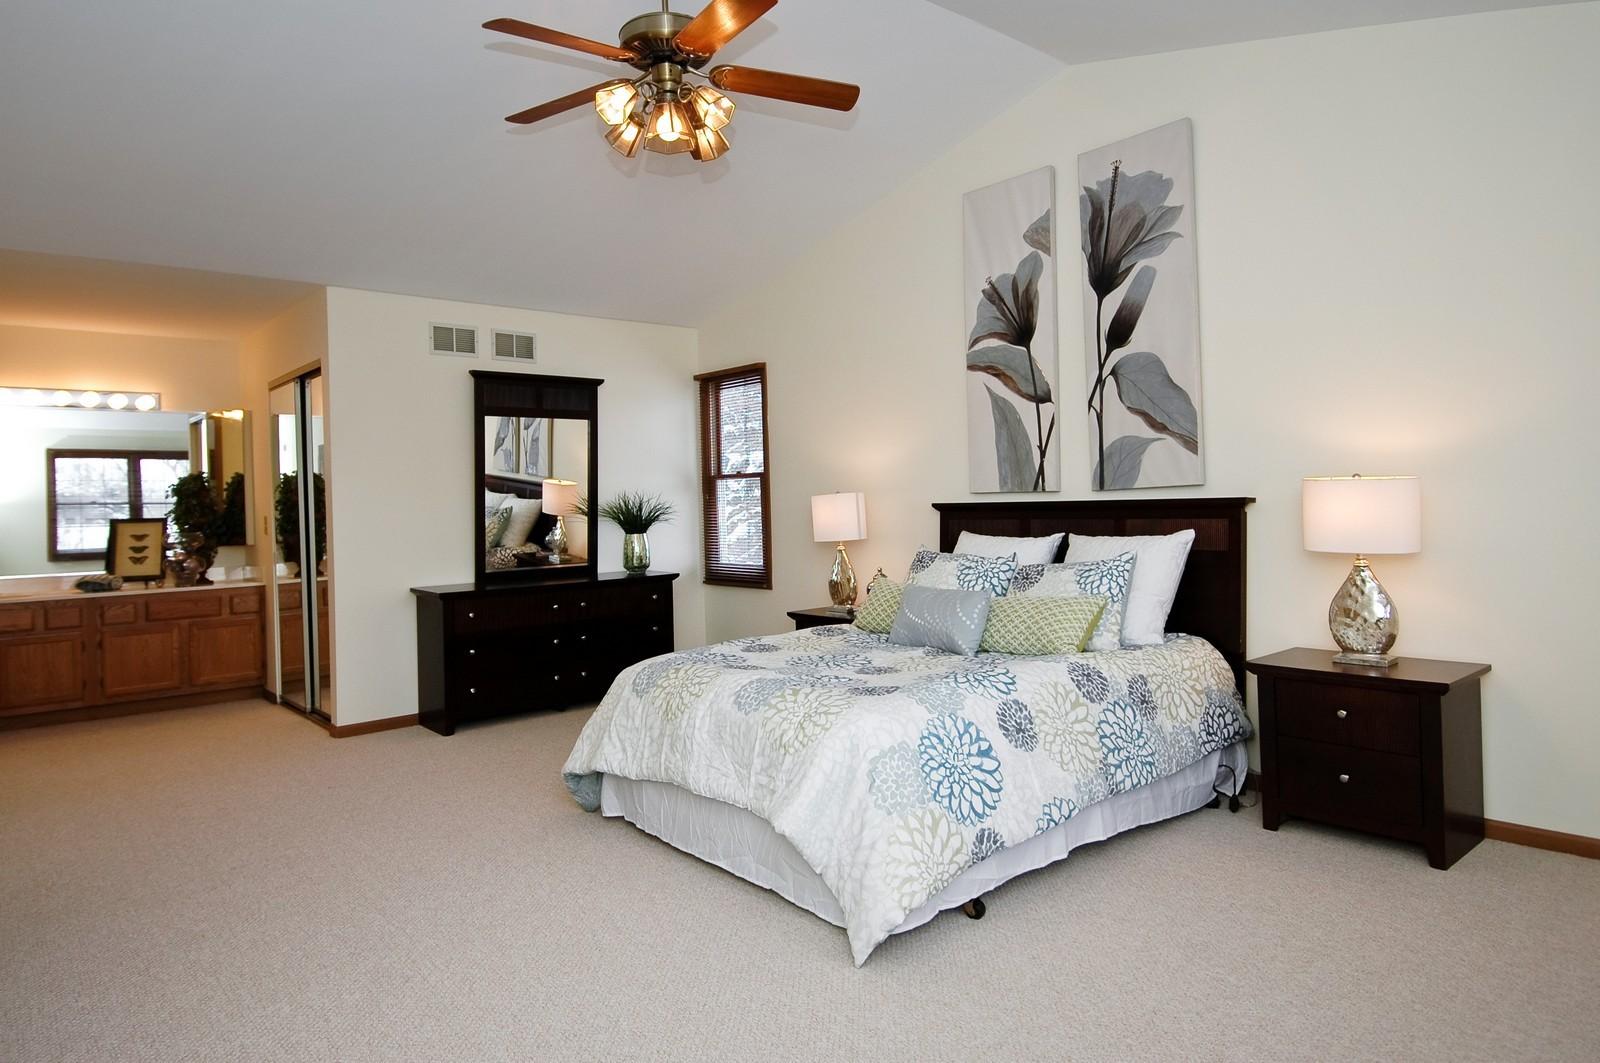 Real Estate Photography - 62 Crystal Ridge Dr, Crystal Lake, IL, 60012 - Master Bedroom